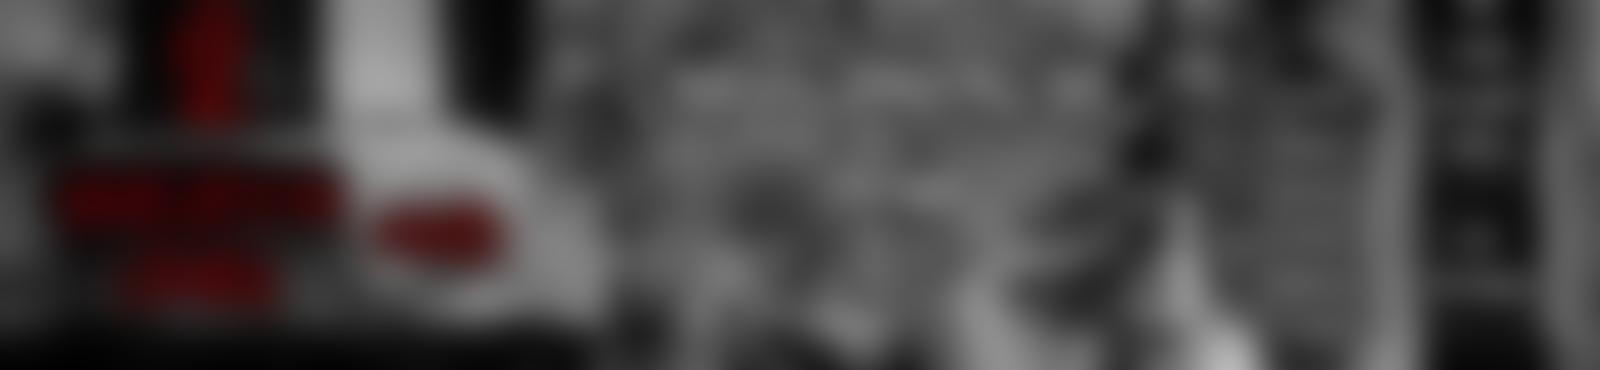 Blurred 59b82958 c575 4c3d a78d b32a528bc182